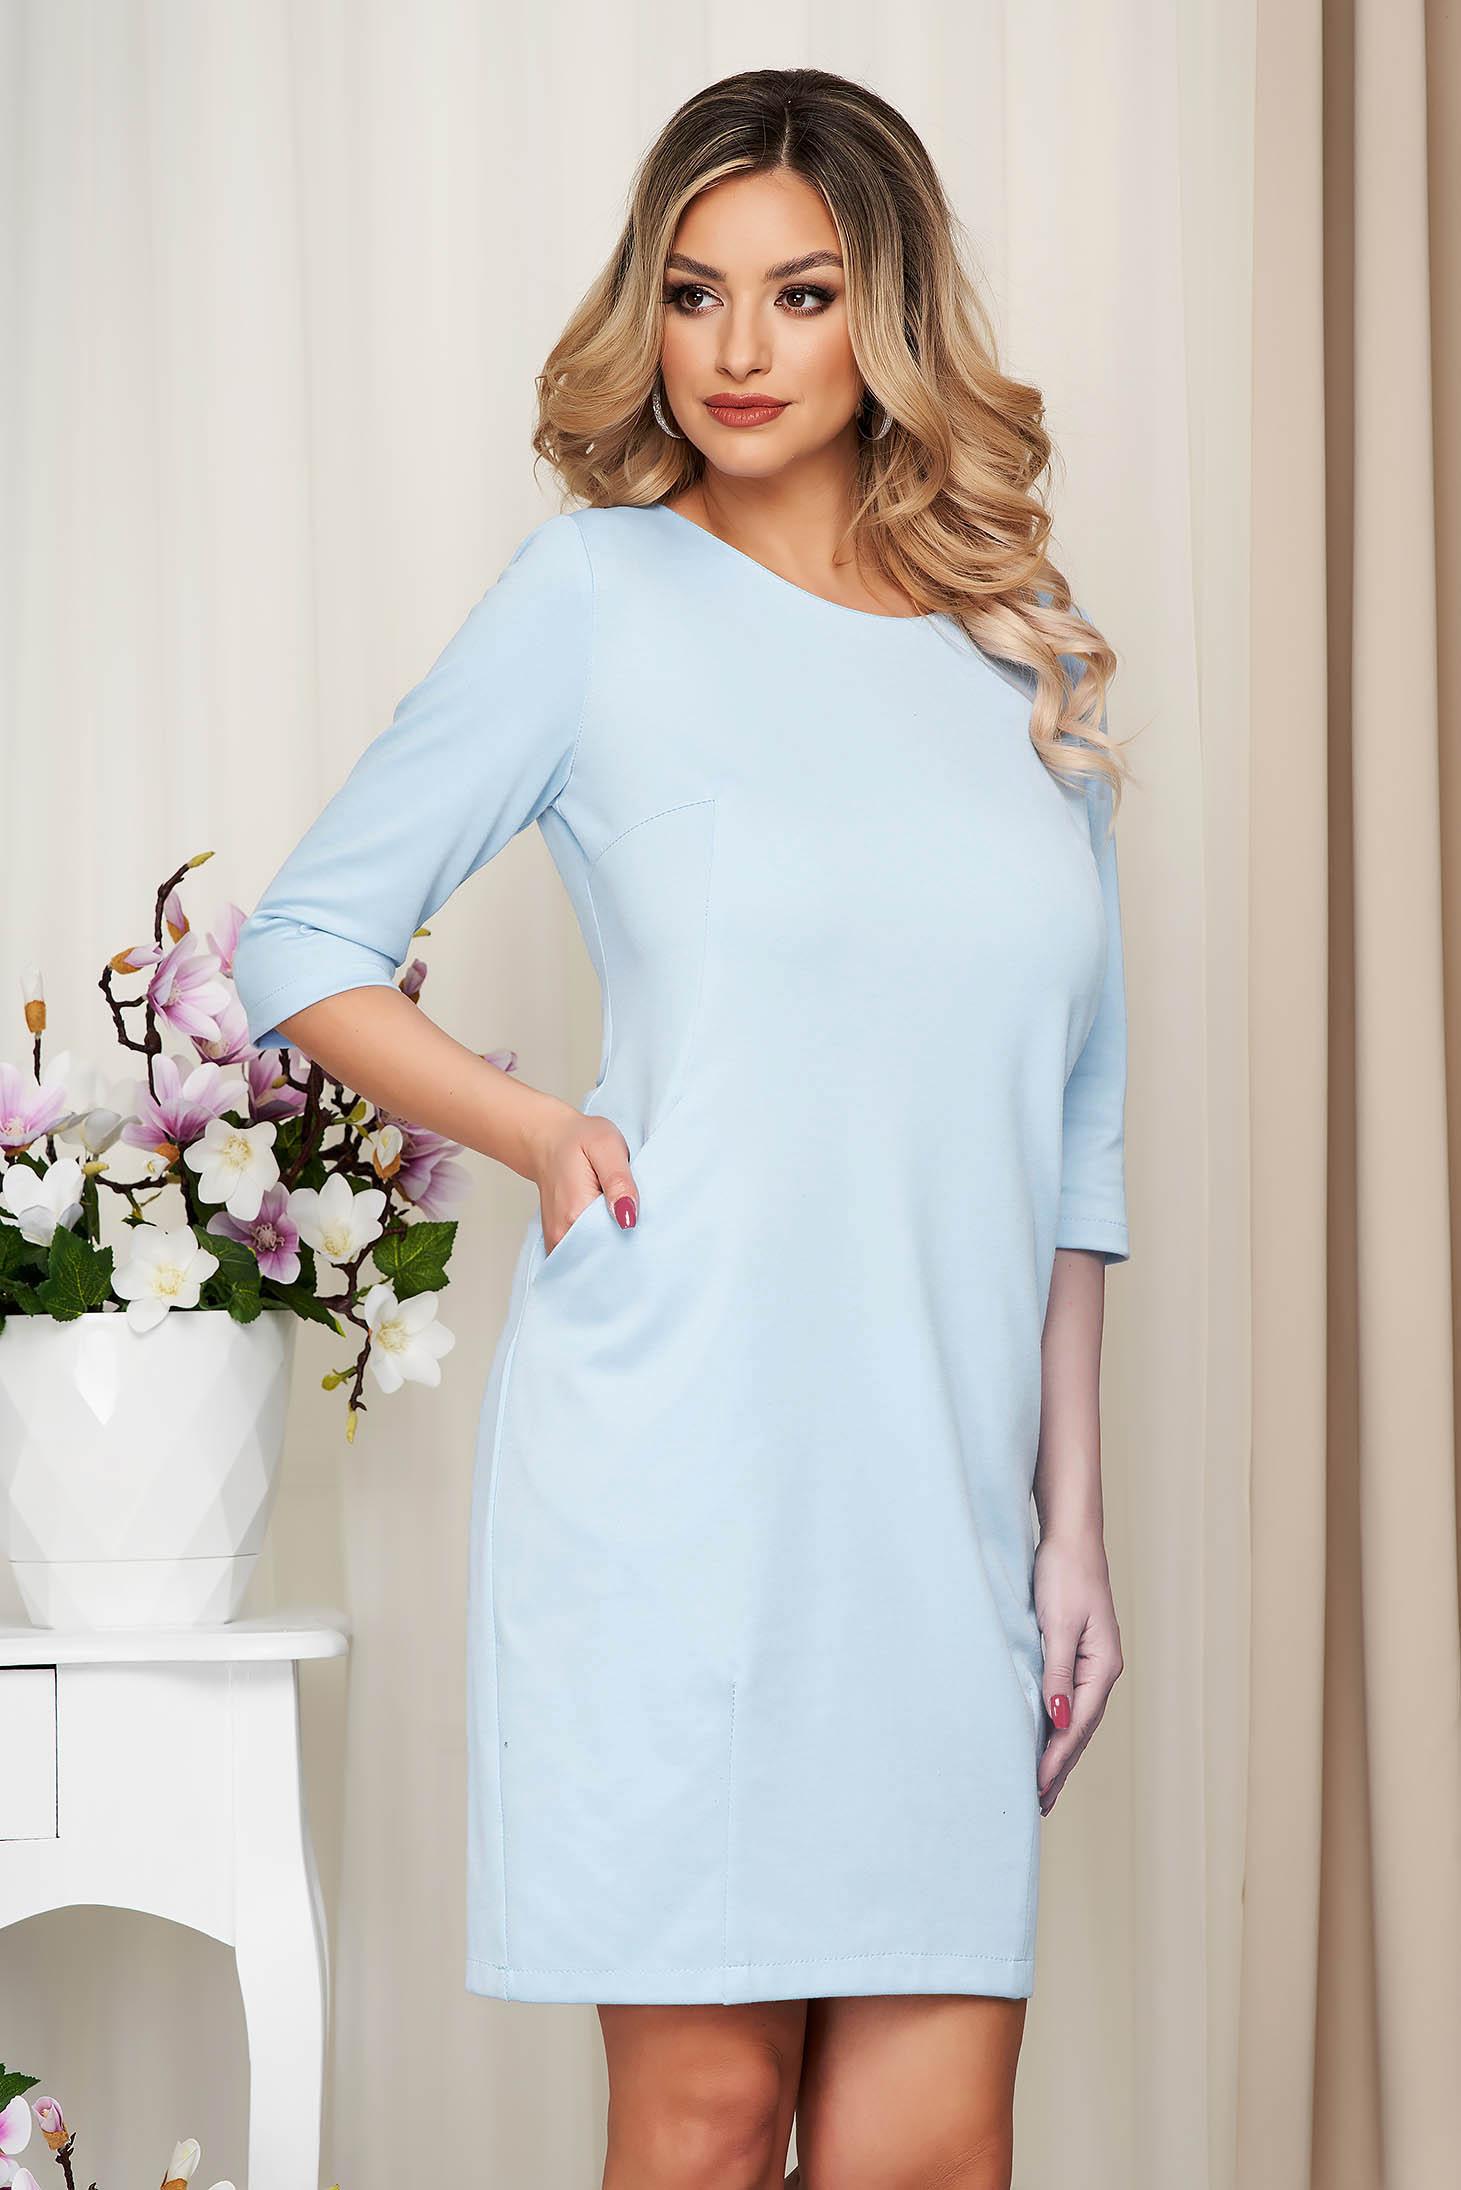 Dress lightblue office slightly elastic fabric straight with pockets